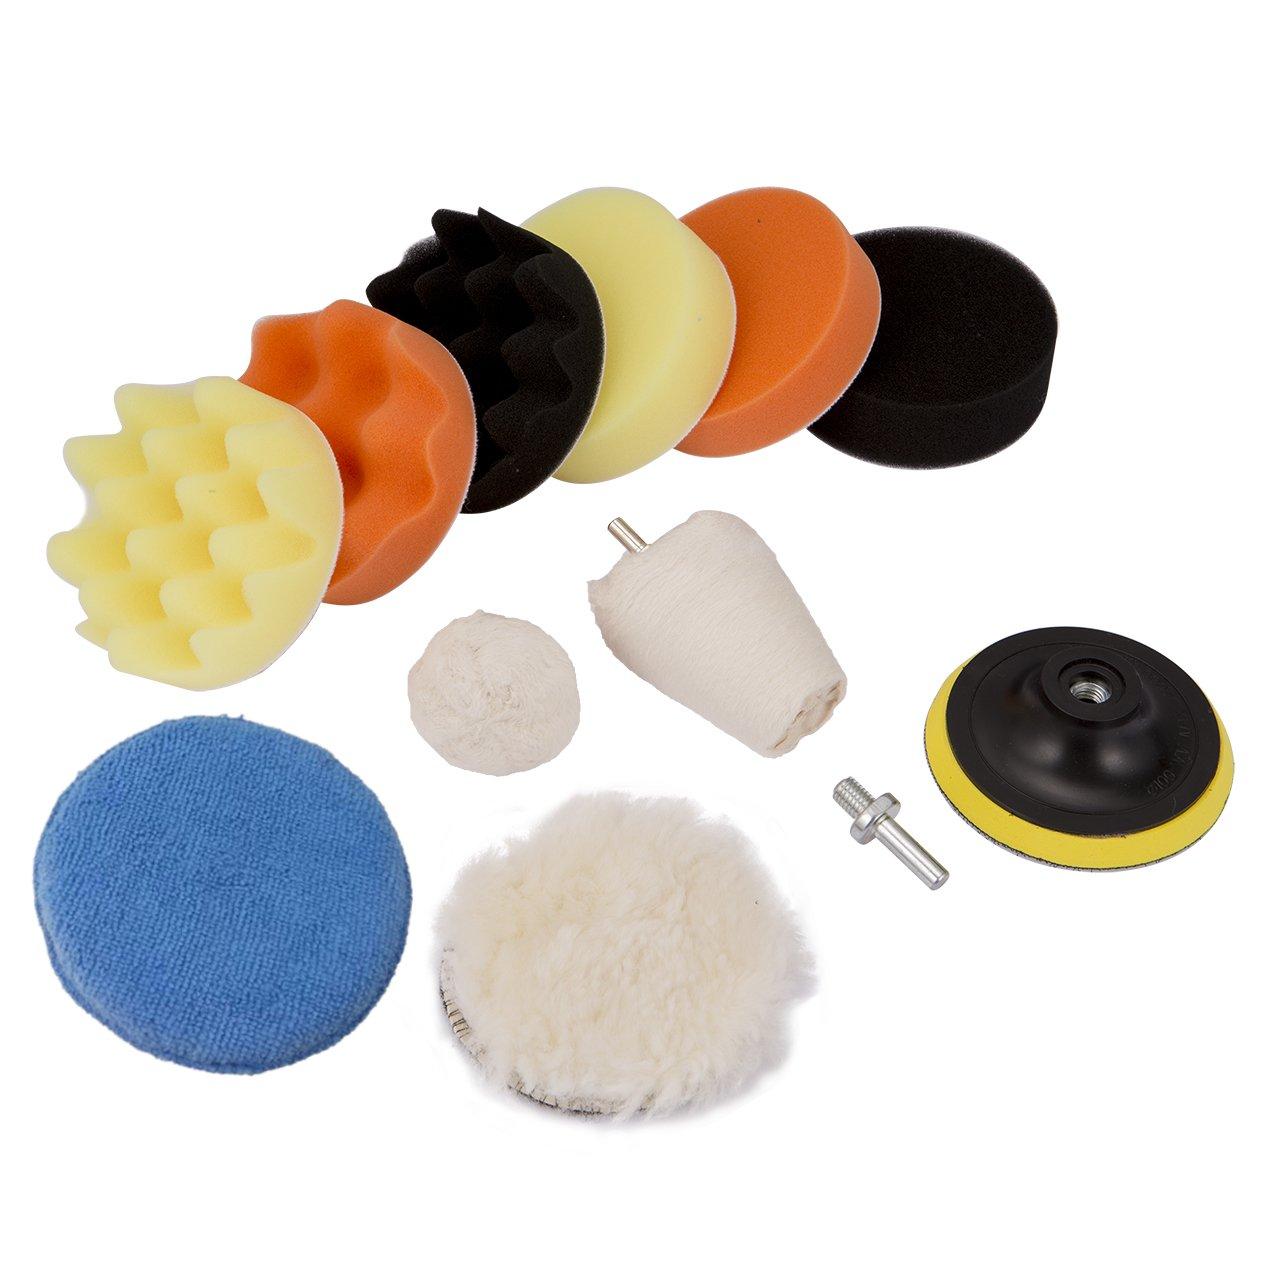 DEDC 4inch/100mm Sponge Polishing Waxing Buffing Pads Set Compound Drill Adapter Kit 11Pcs for Car Sanding Polishing Waxing Sealing Glaze